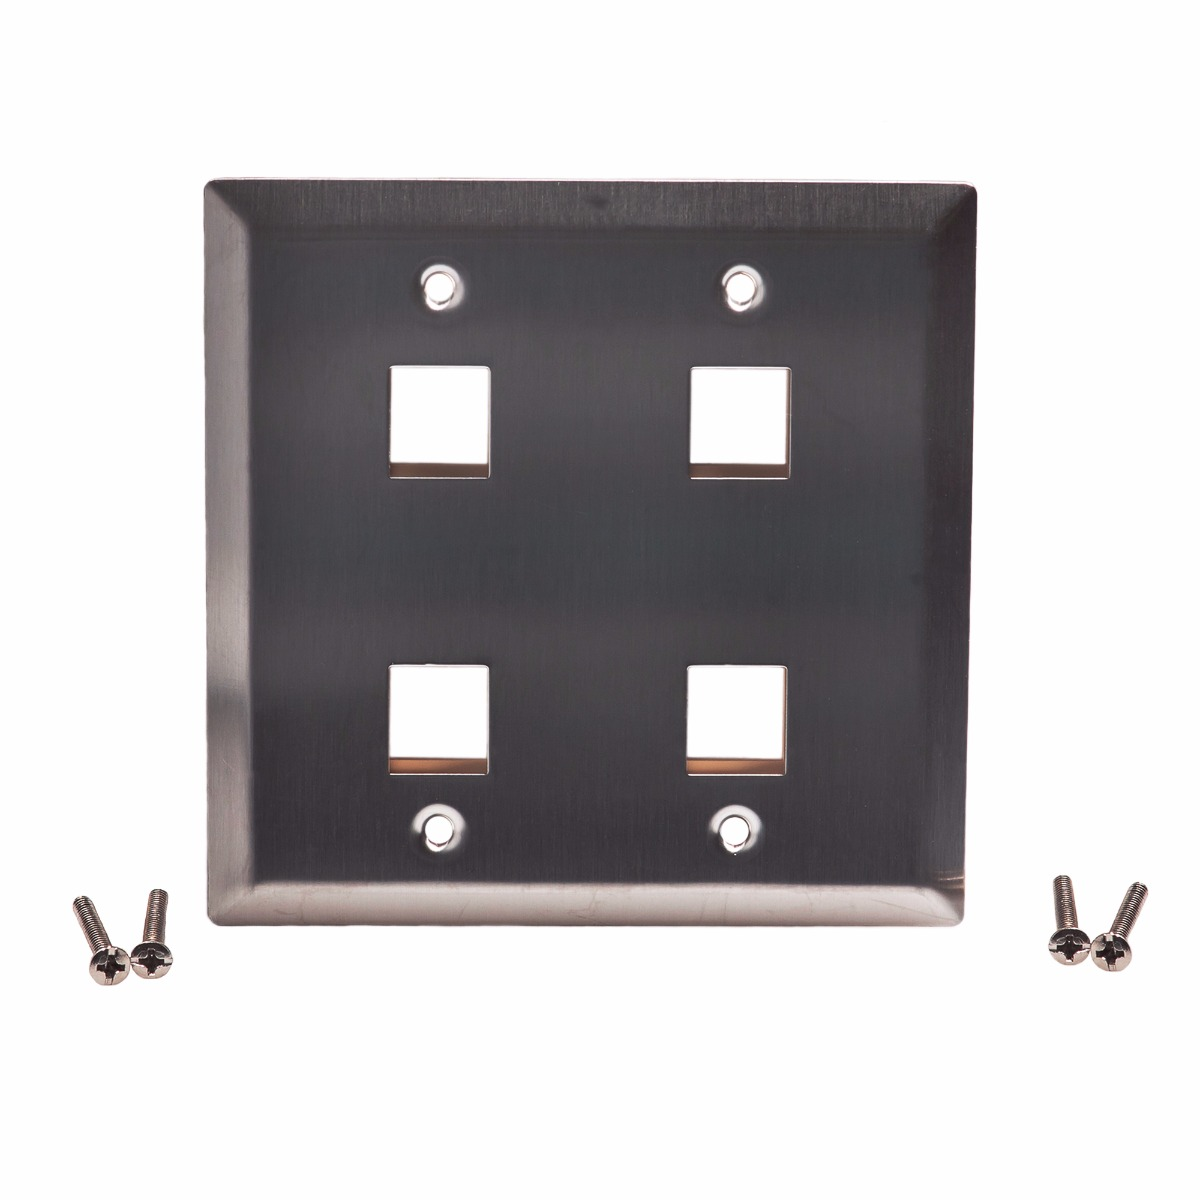 Standard Keystone Wall Plates Plastic & Steel | ShowMeCables.com